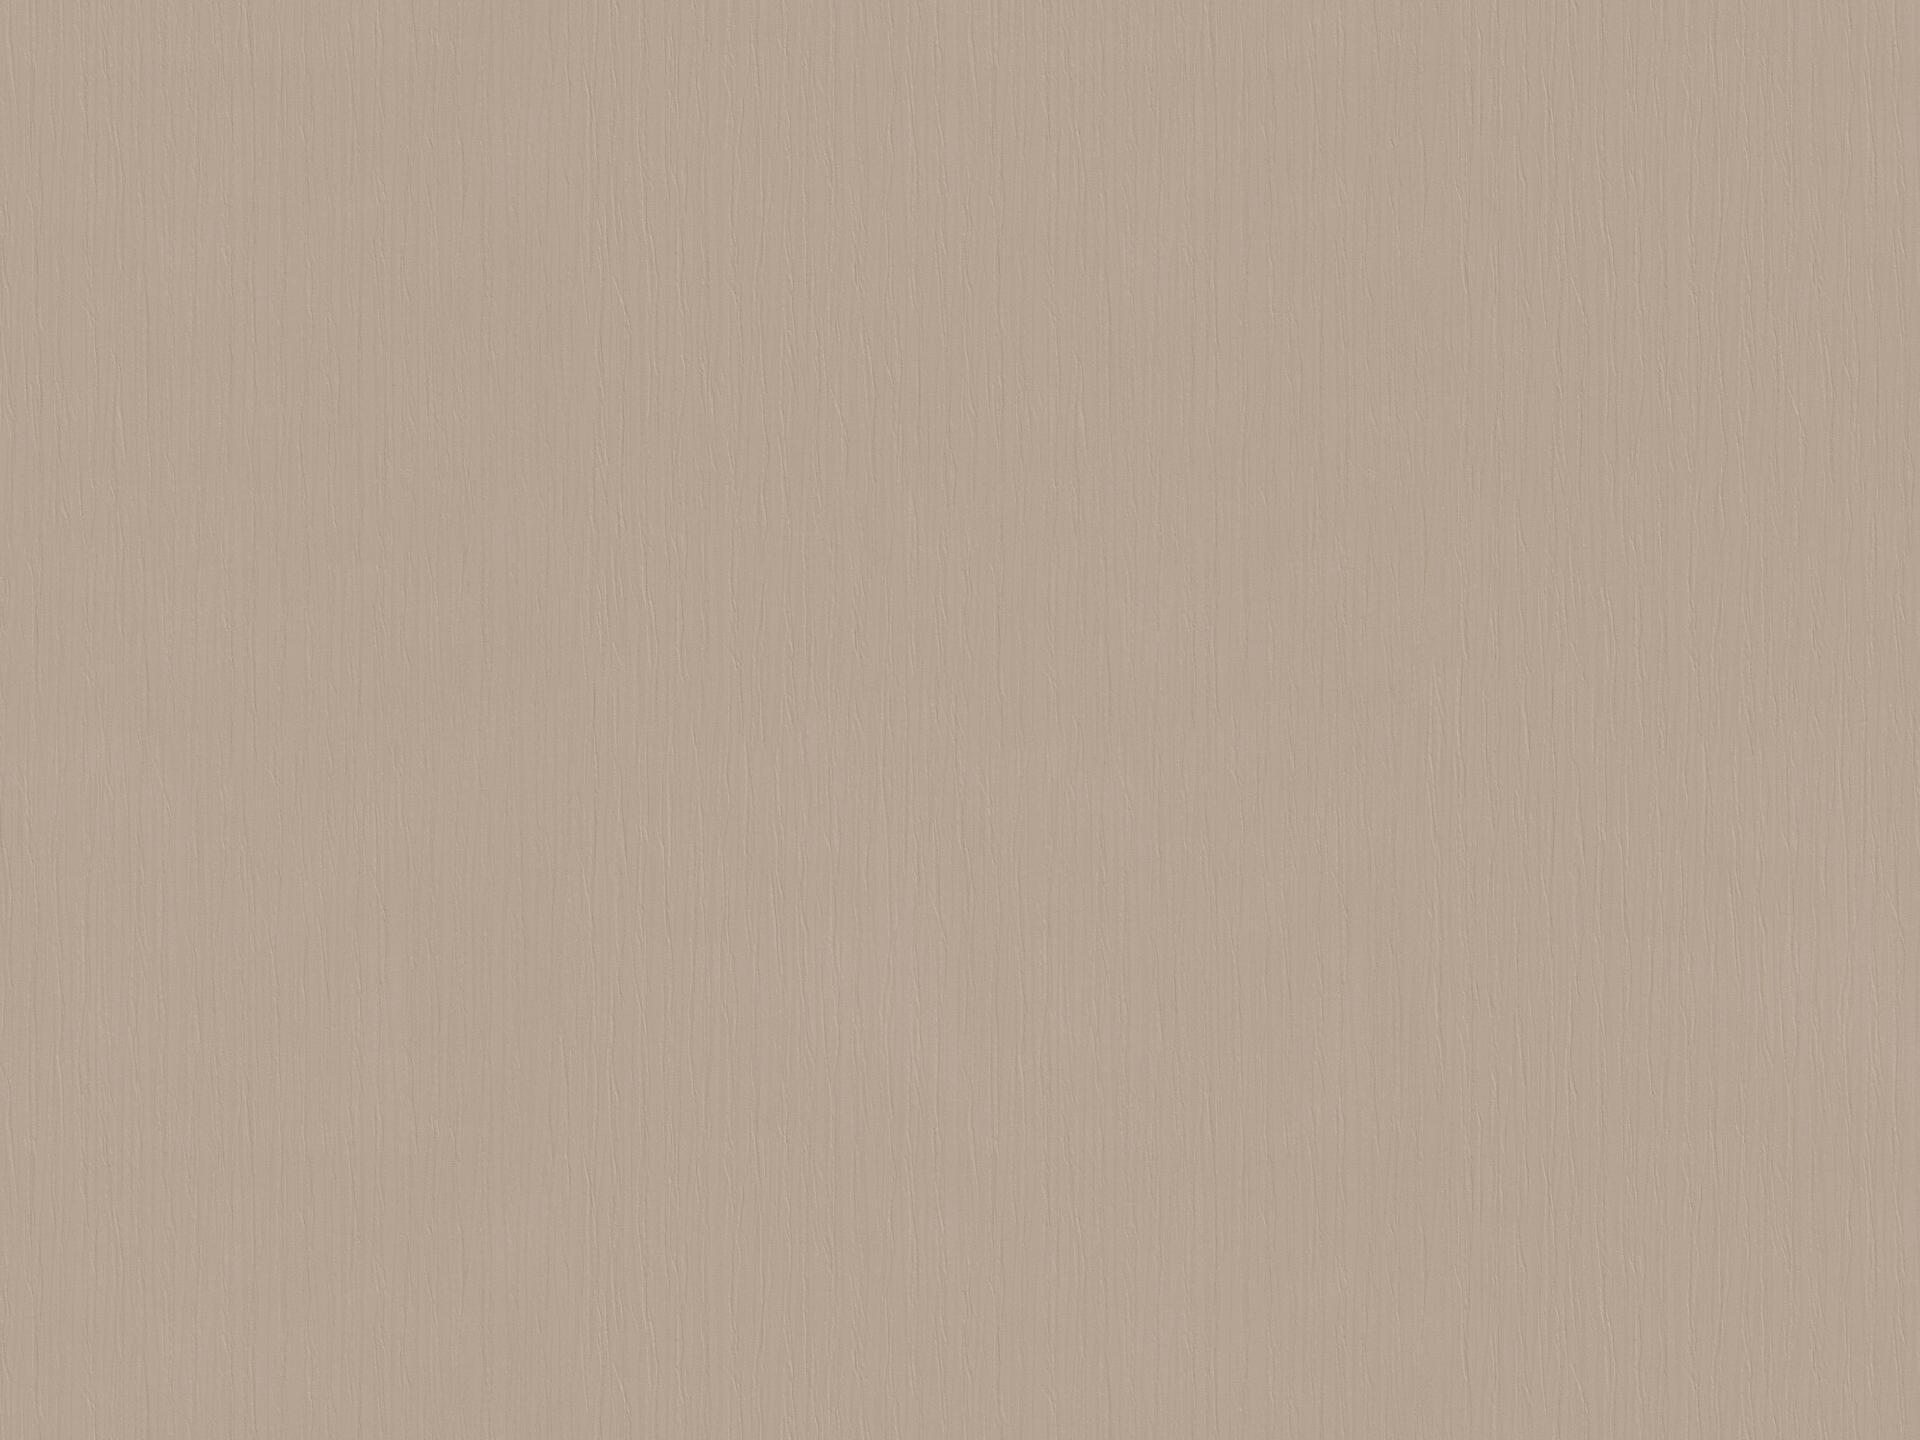 Superfresco Easy papier peint intissé Raffia liniair taupe | Hubo